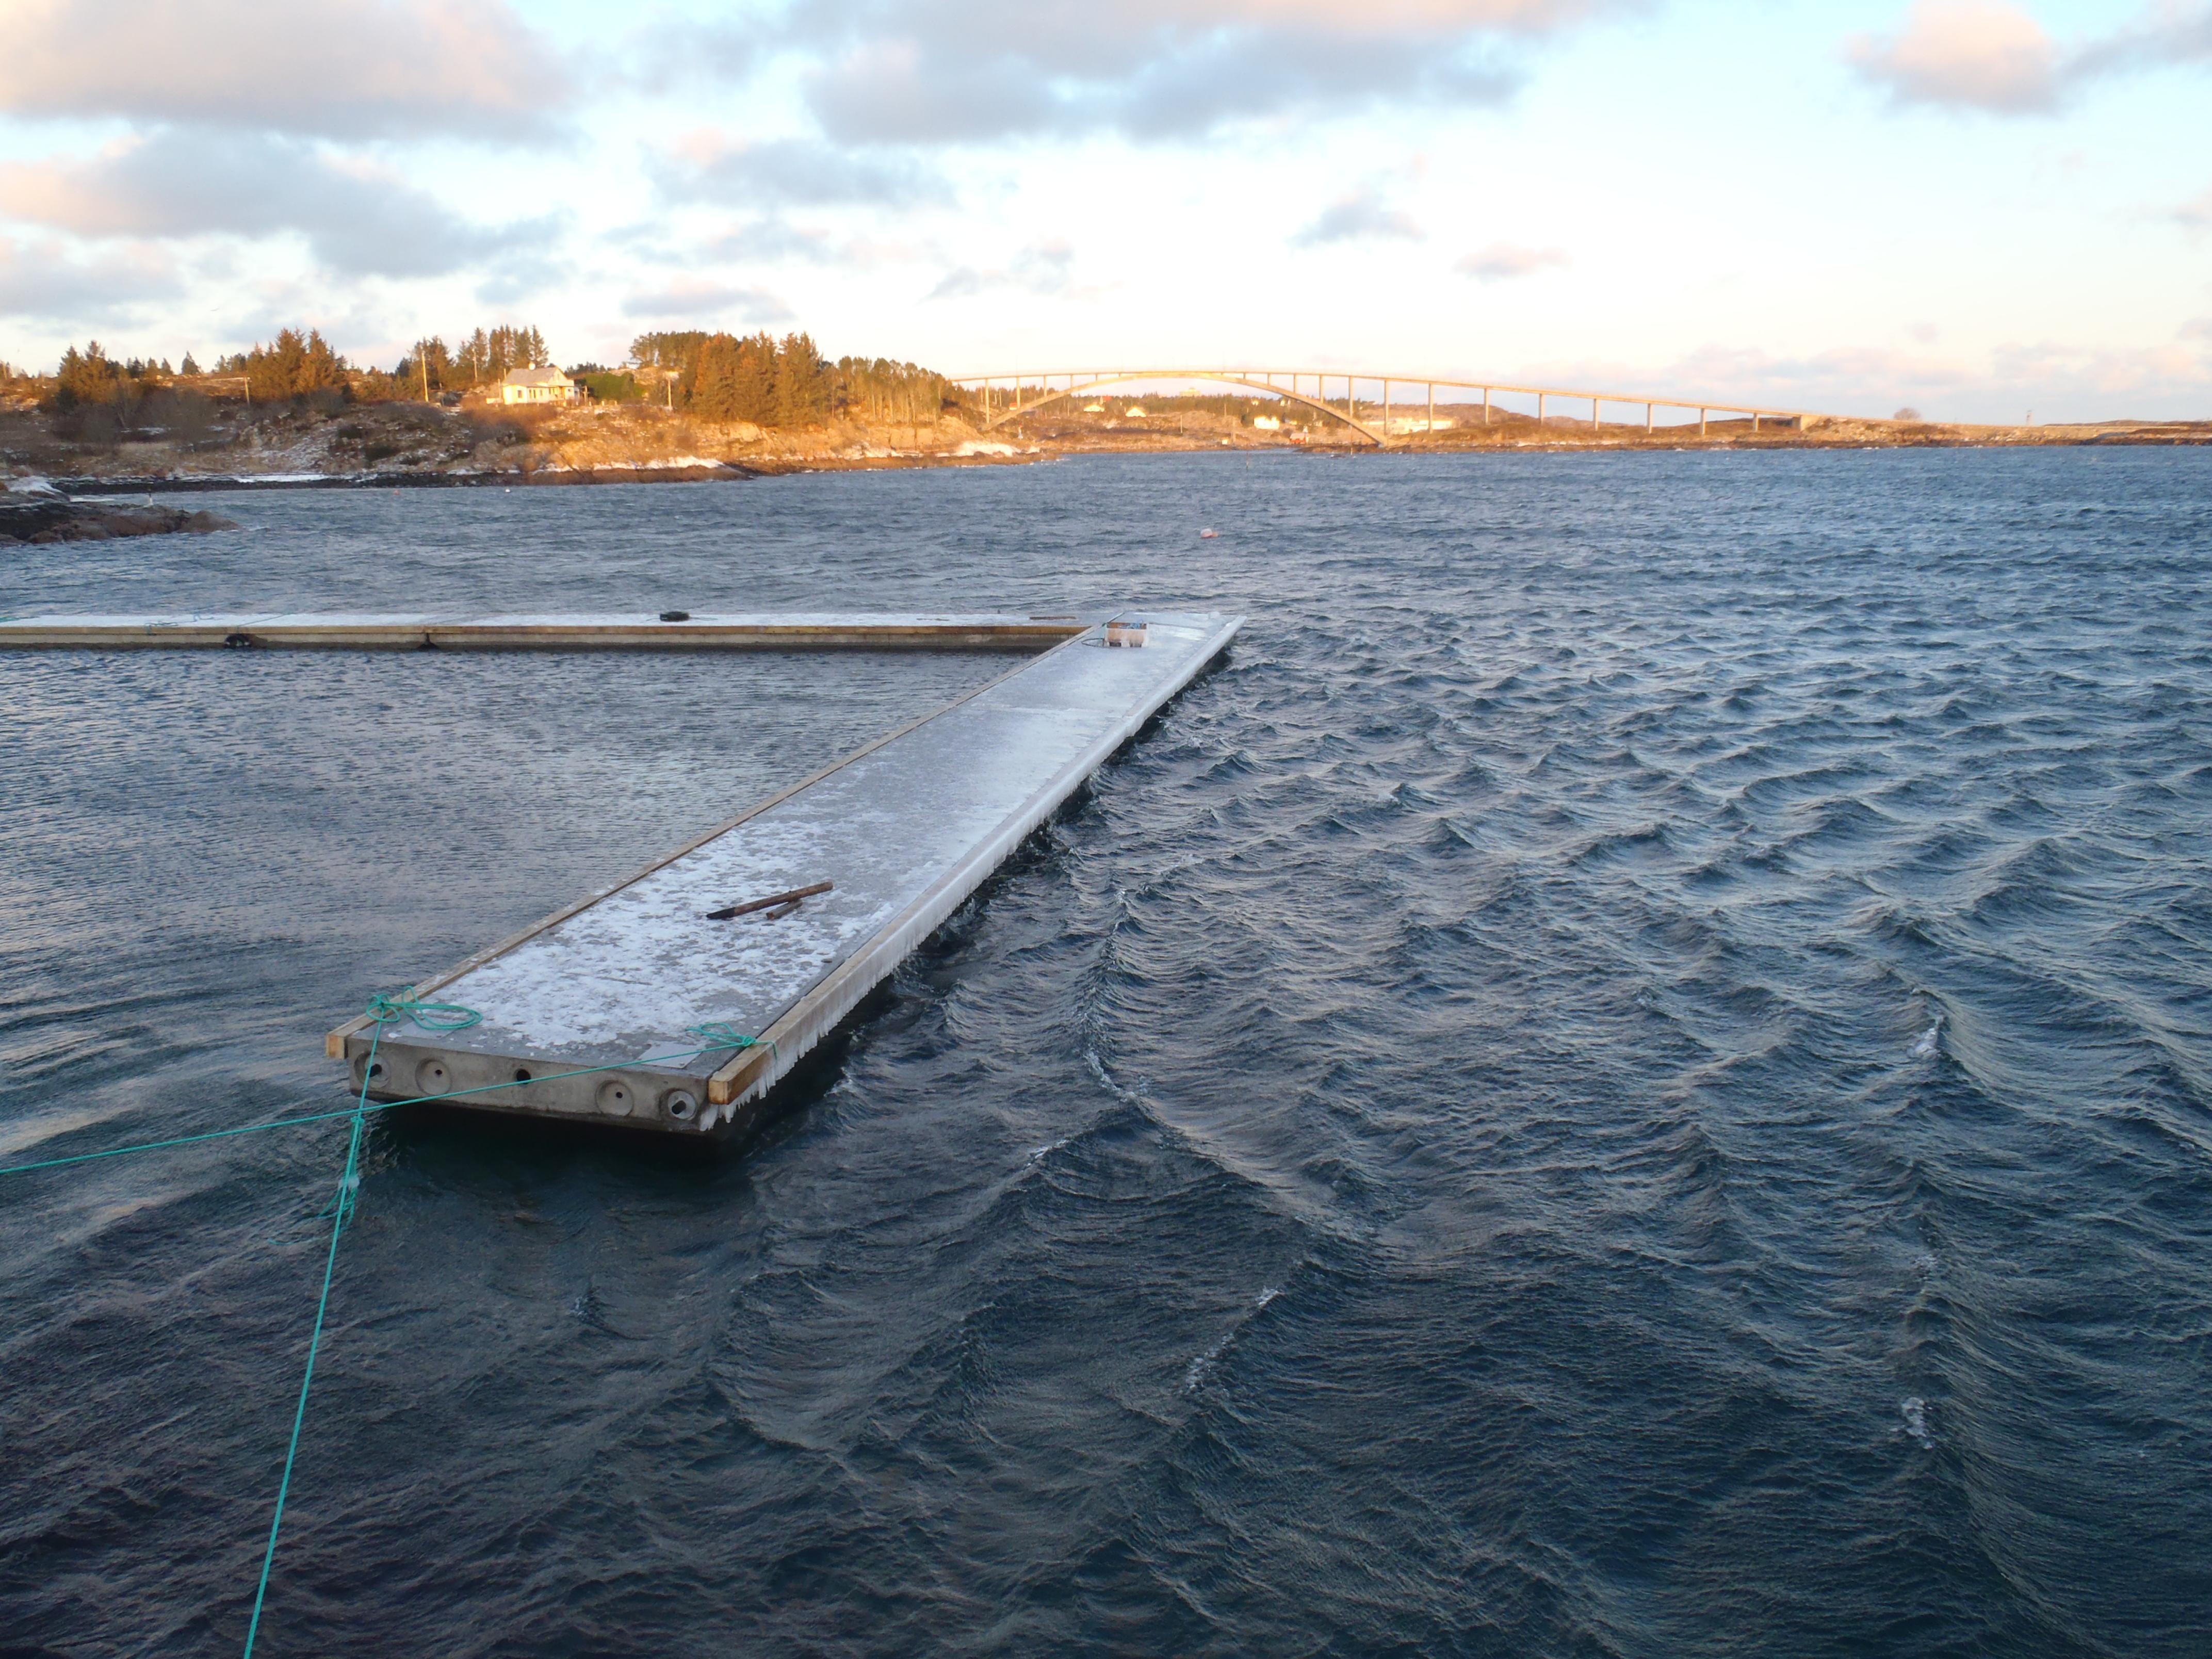 https://www.marinasolutions.no/uploads/Frøya-7.JPG